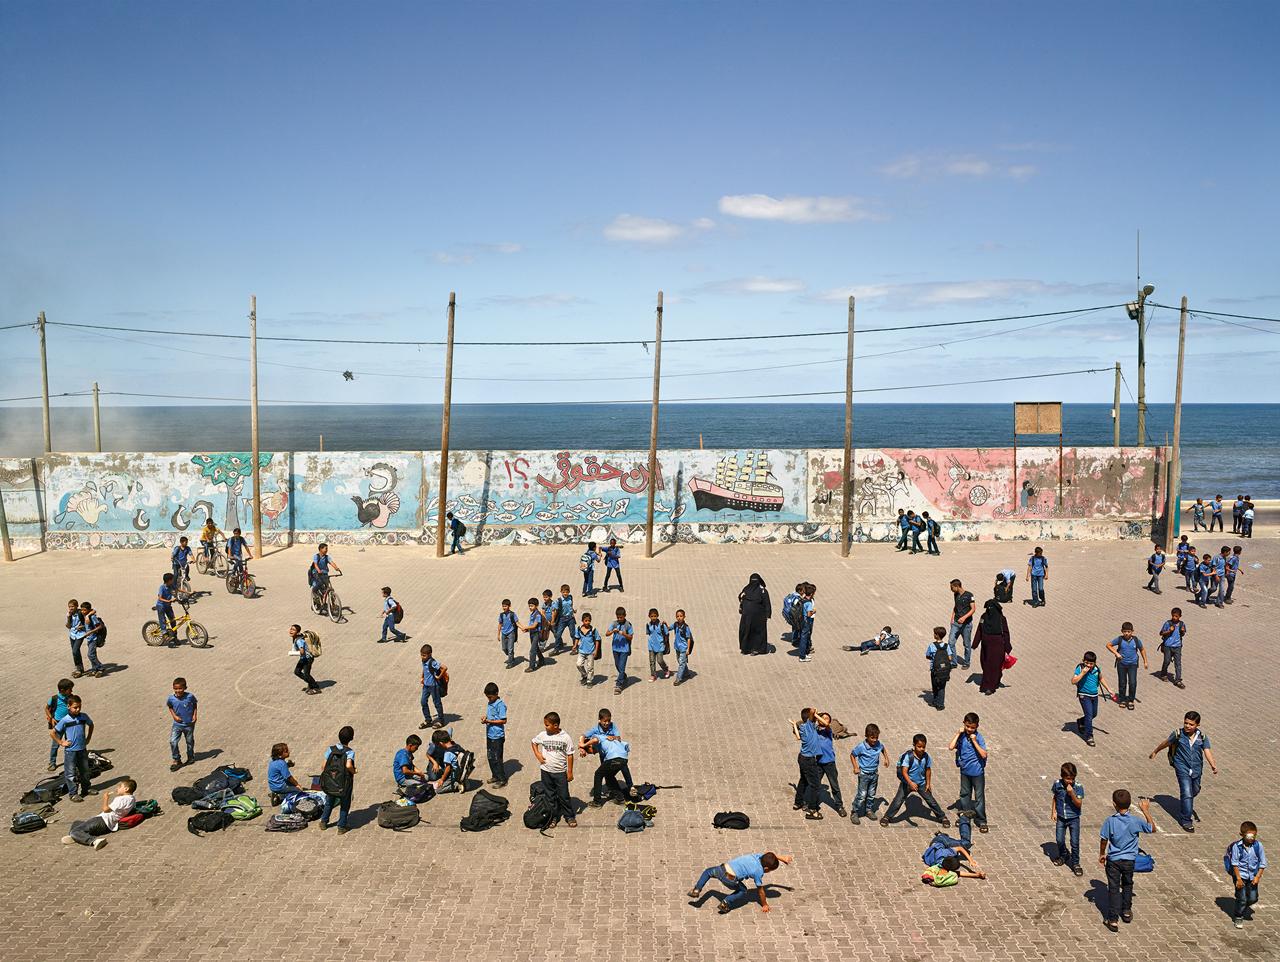 JAMES MOLLISON Deir al-Balah Boys' Elementary, Middle Area, Gaza, September 16, 2013